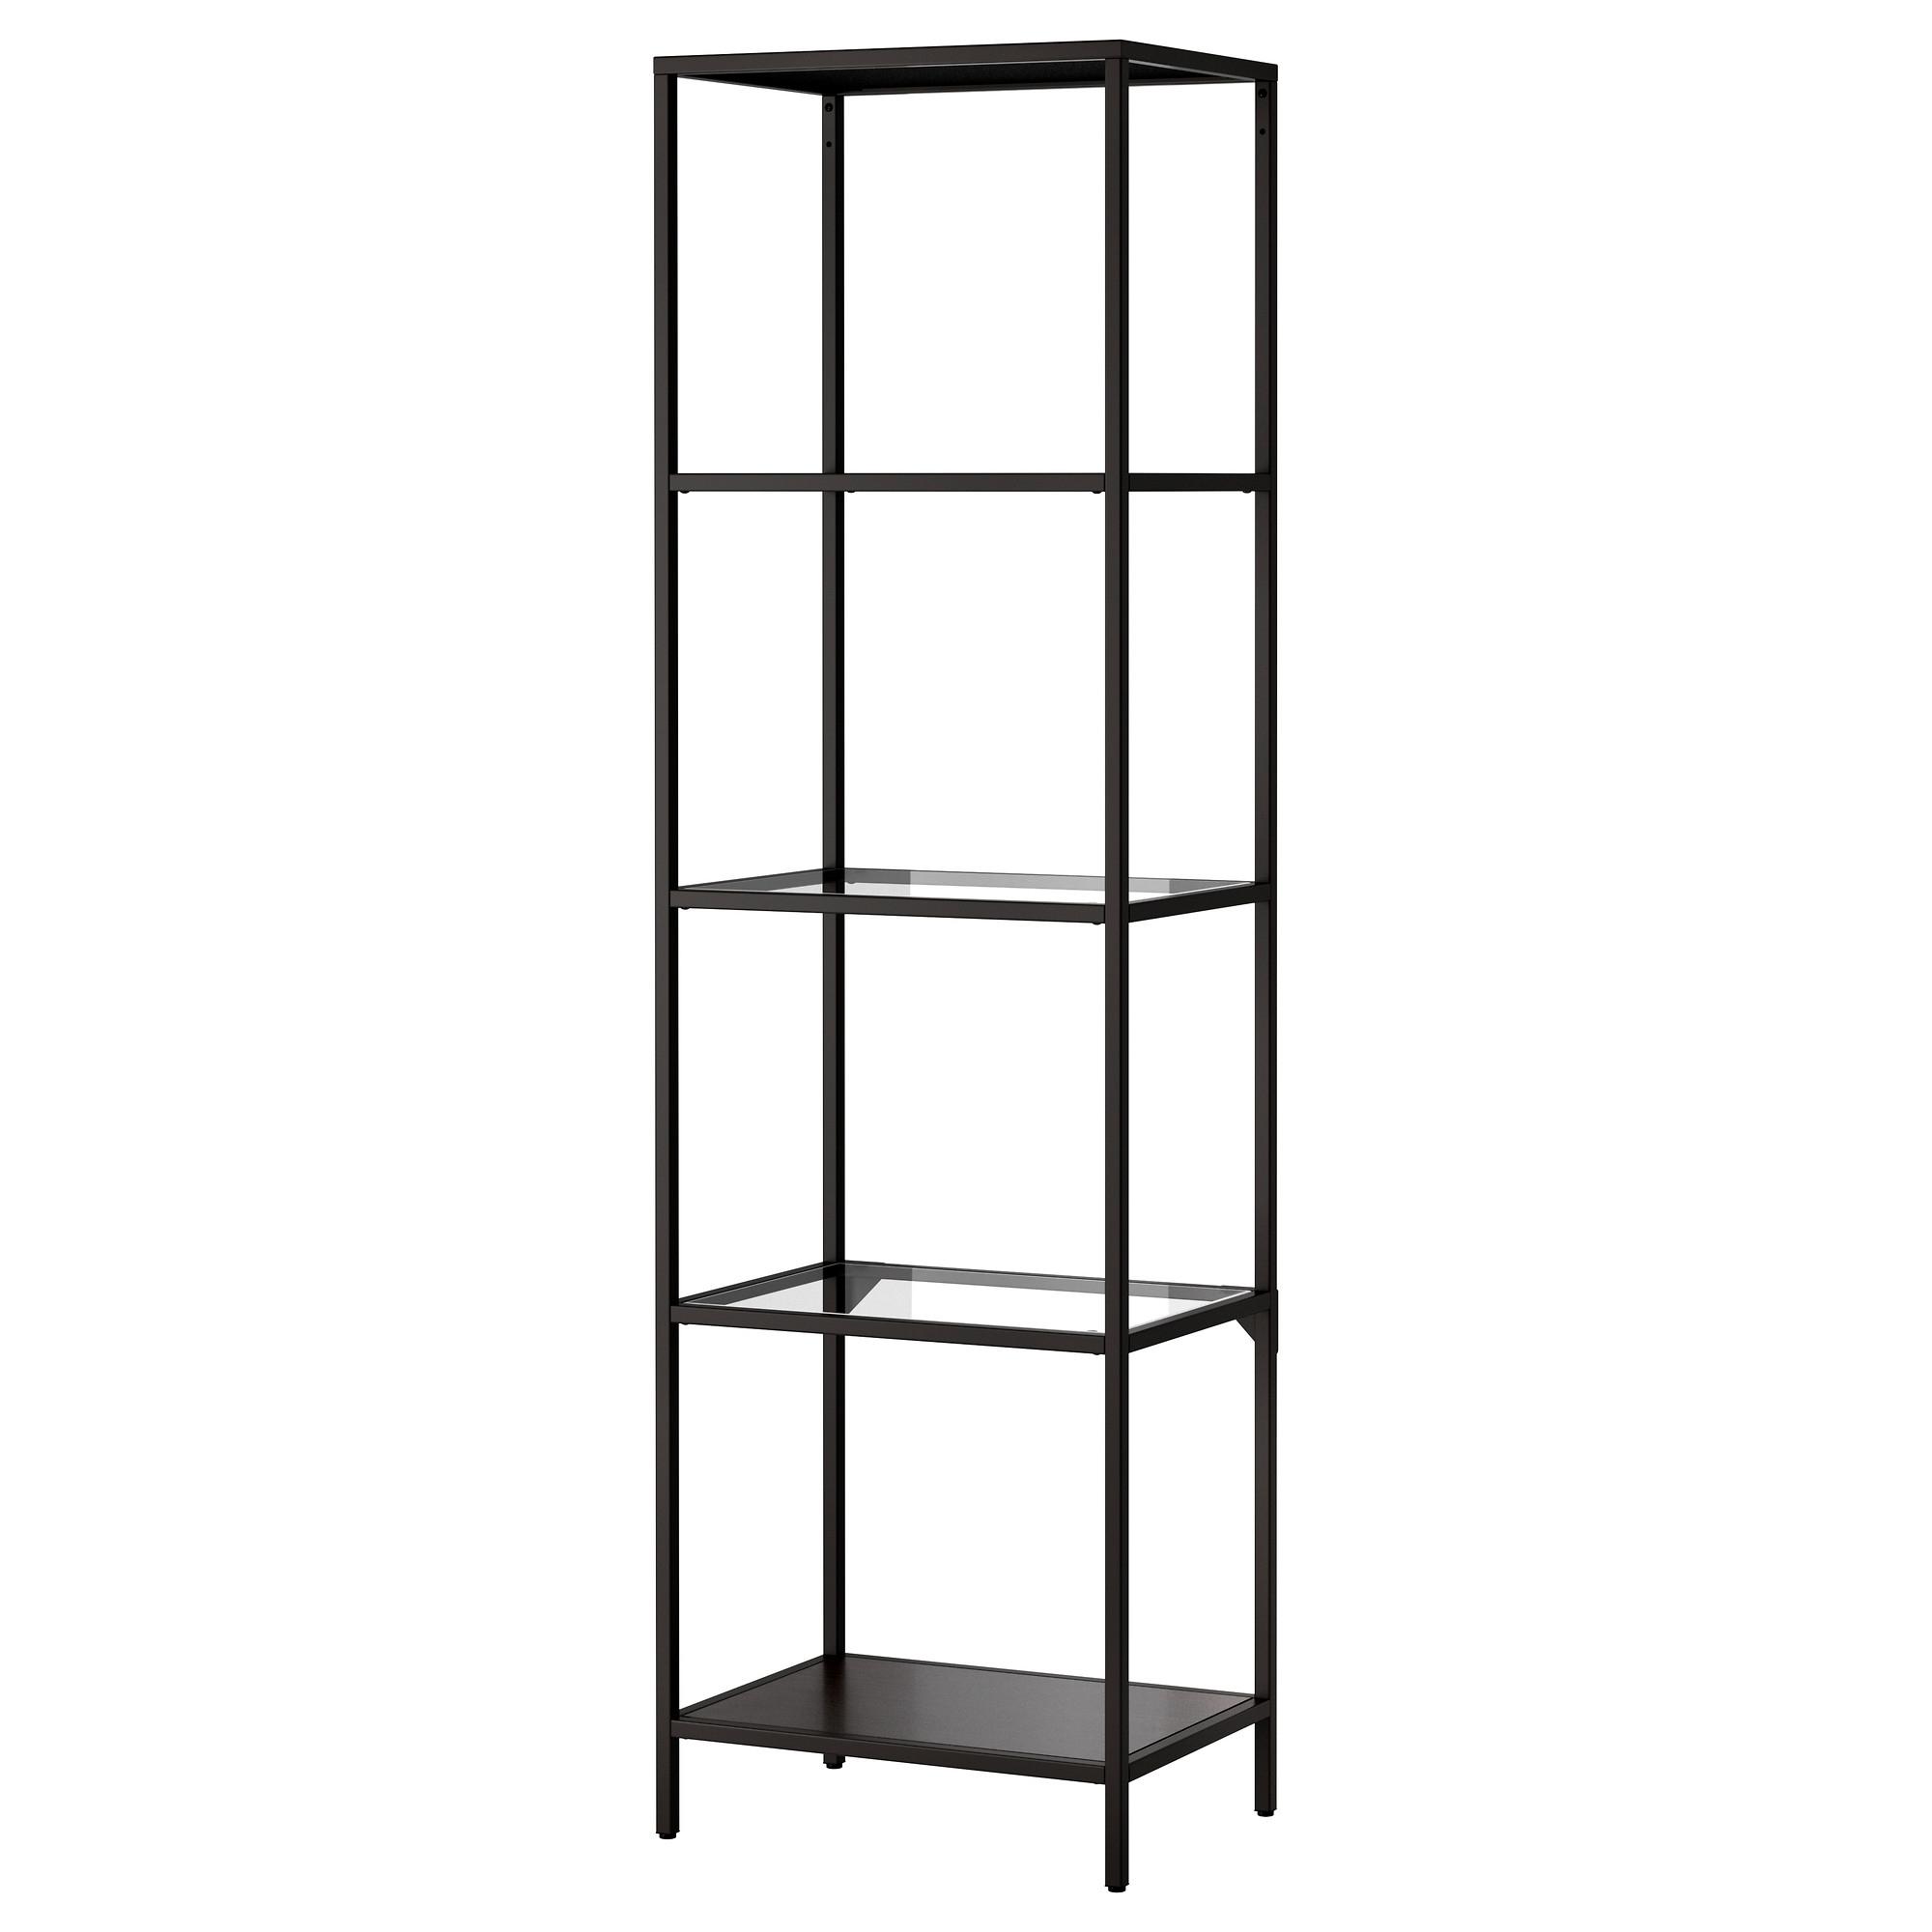 Shelves Shelving Units Ikea For Cheap Shelving Units (View 11 of 15)